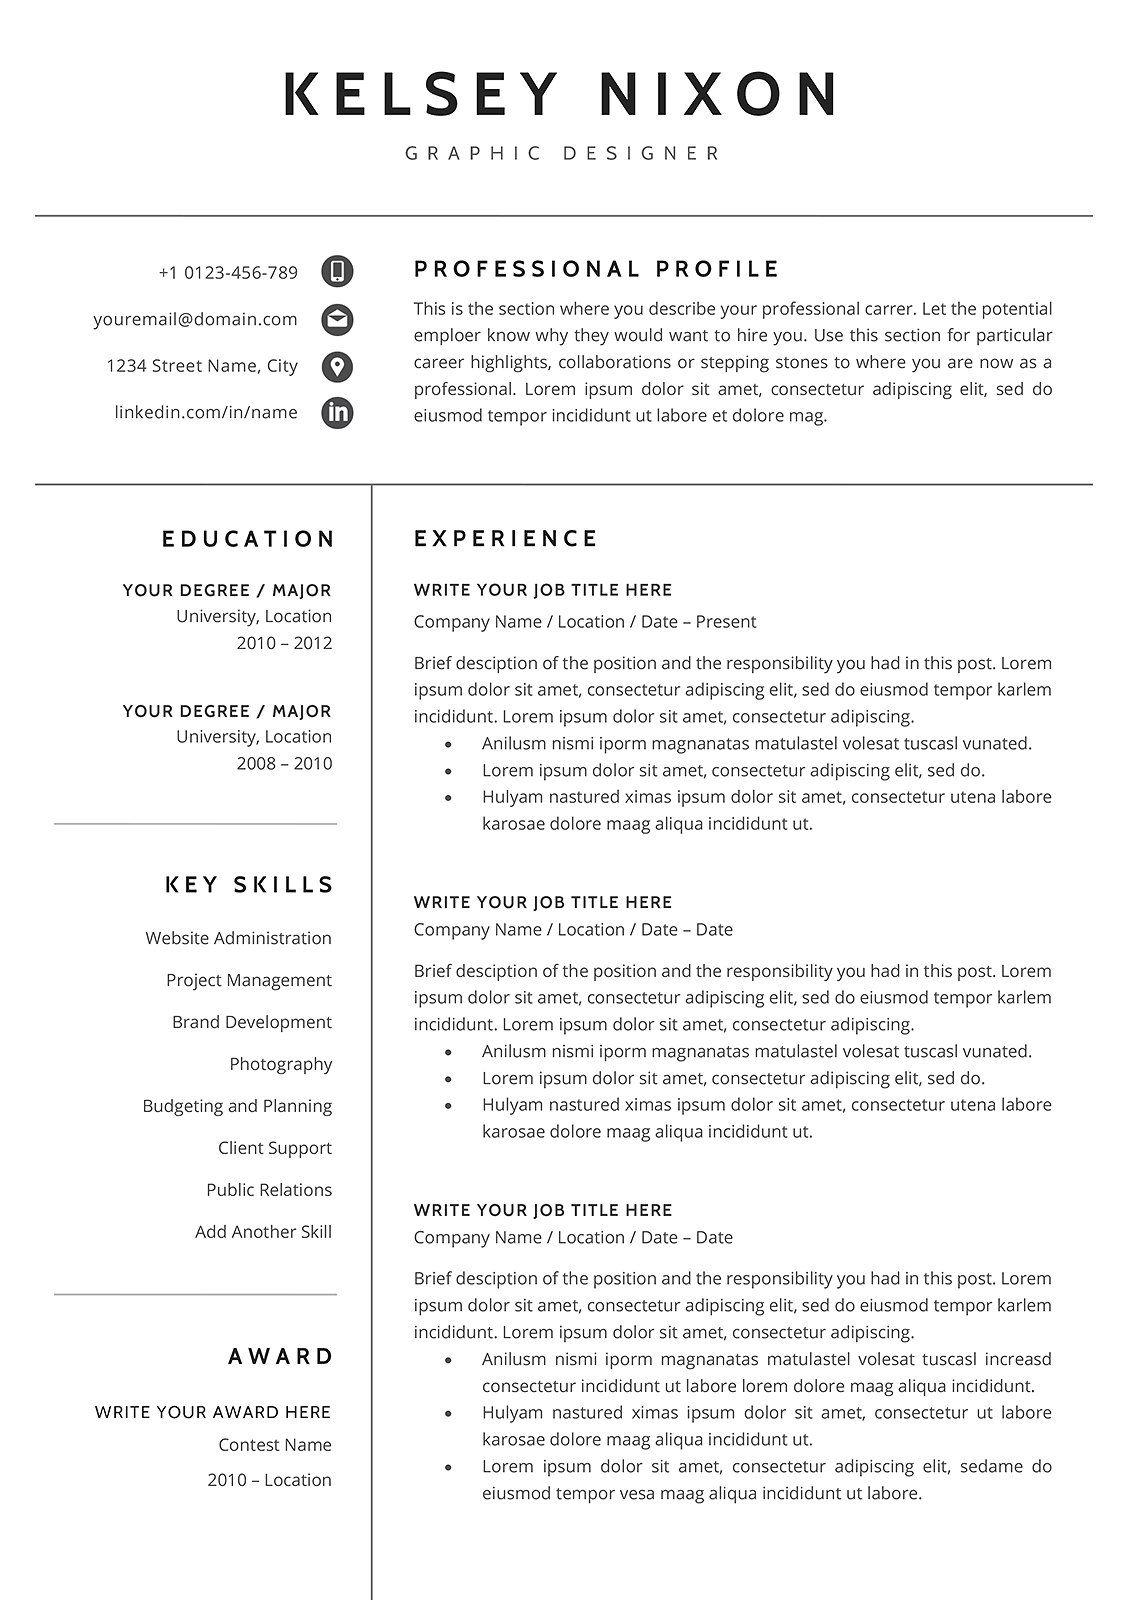 Resume/CV Template KELSEY Cv template, Resume cv